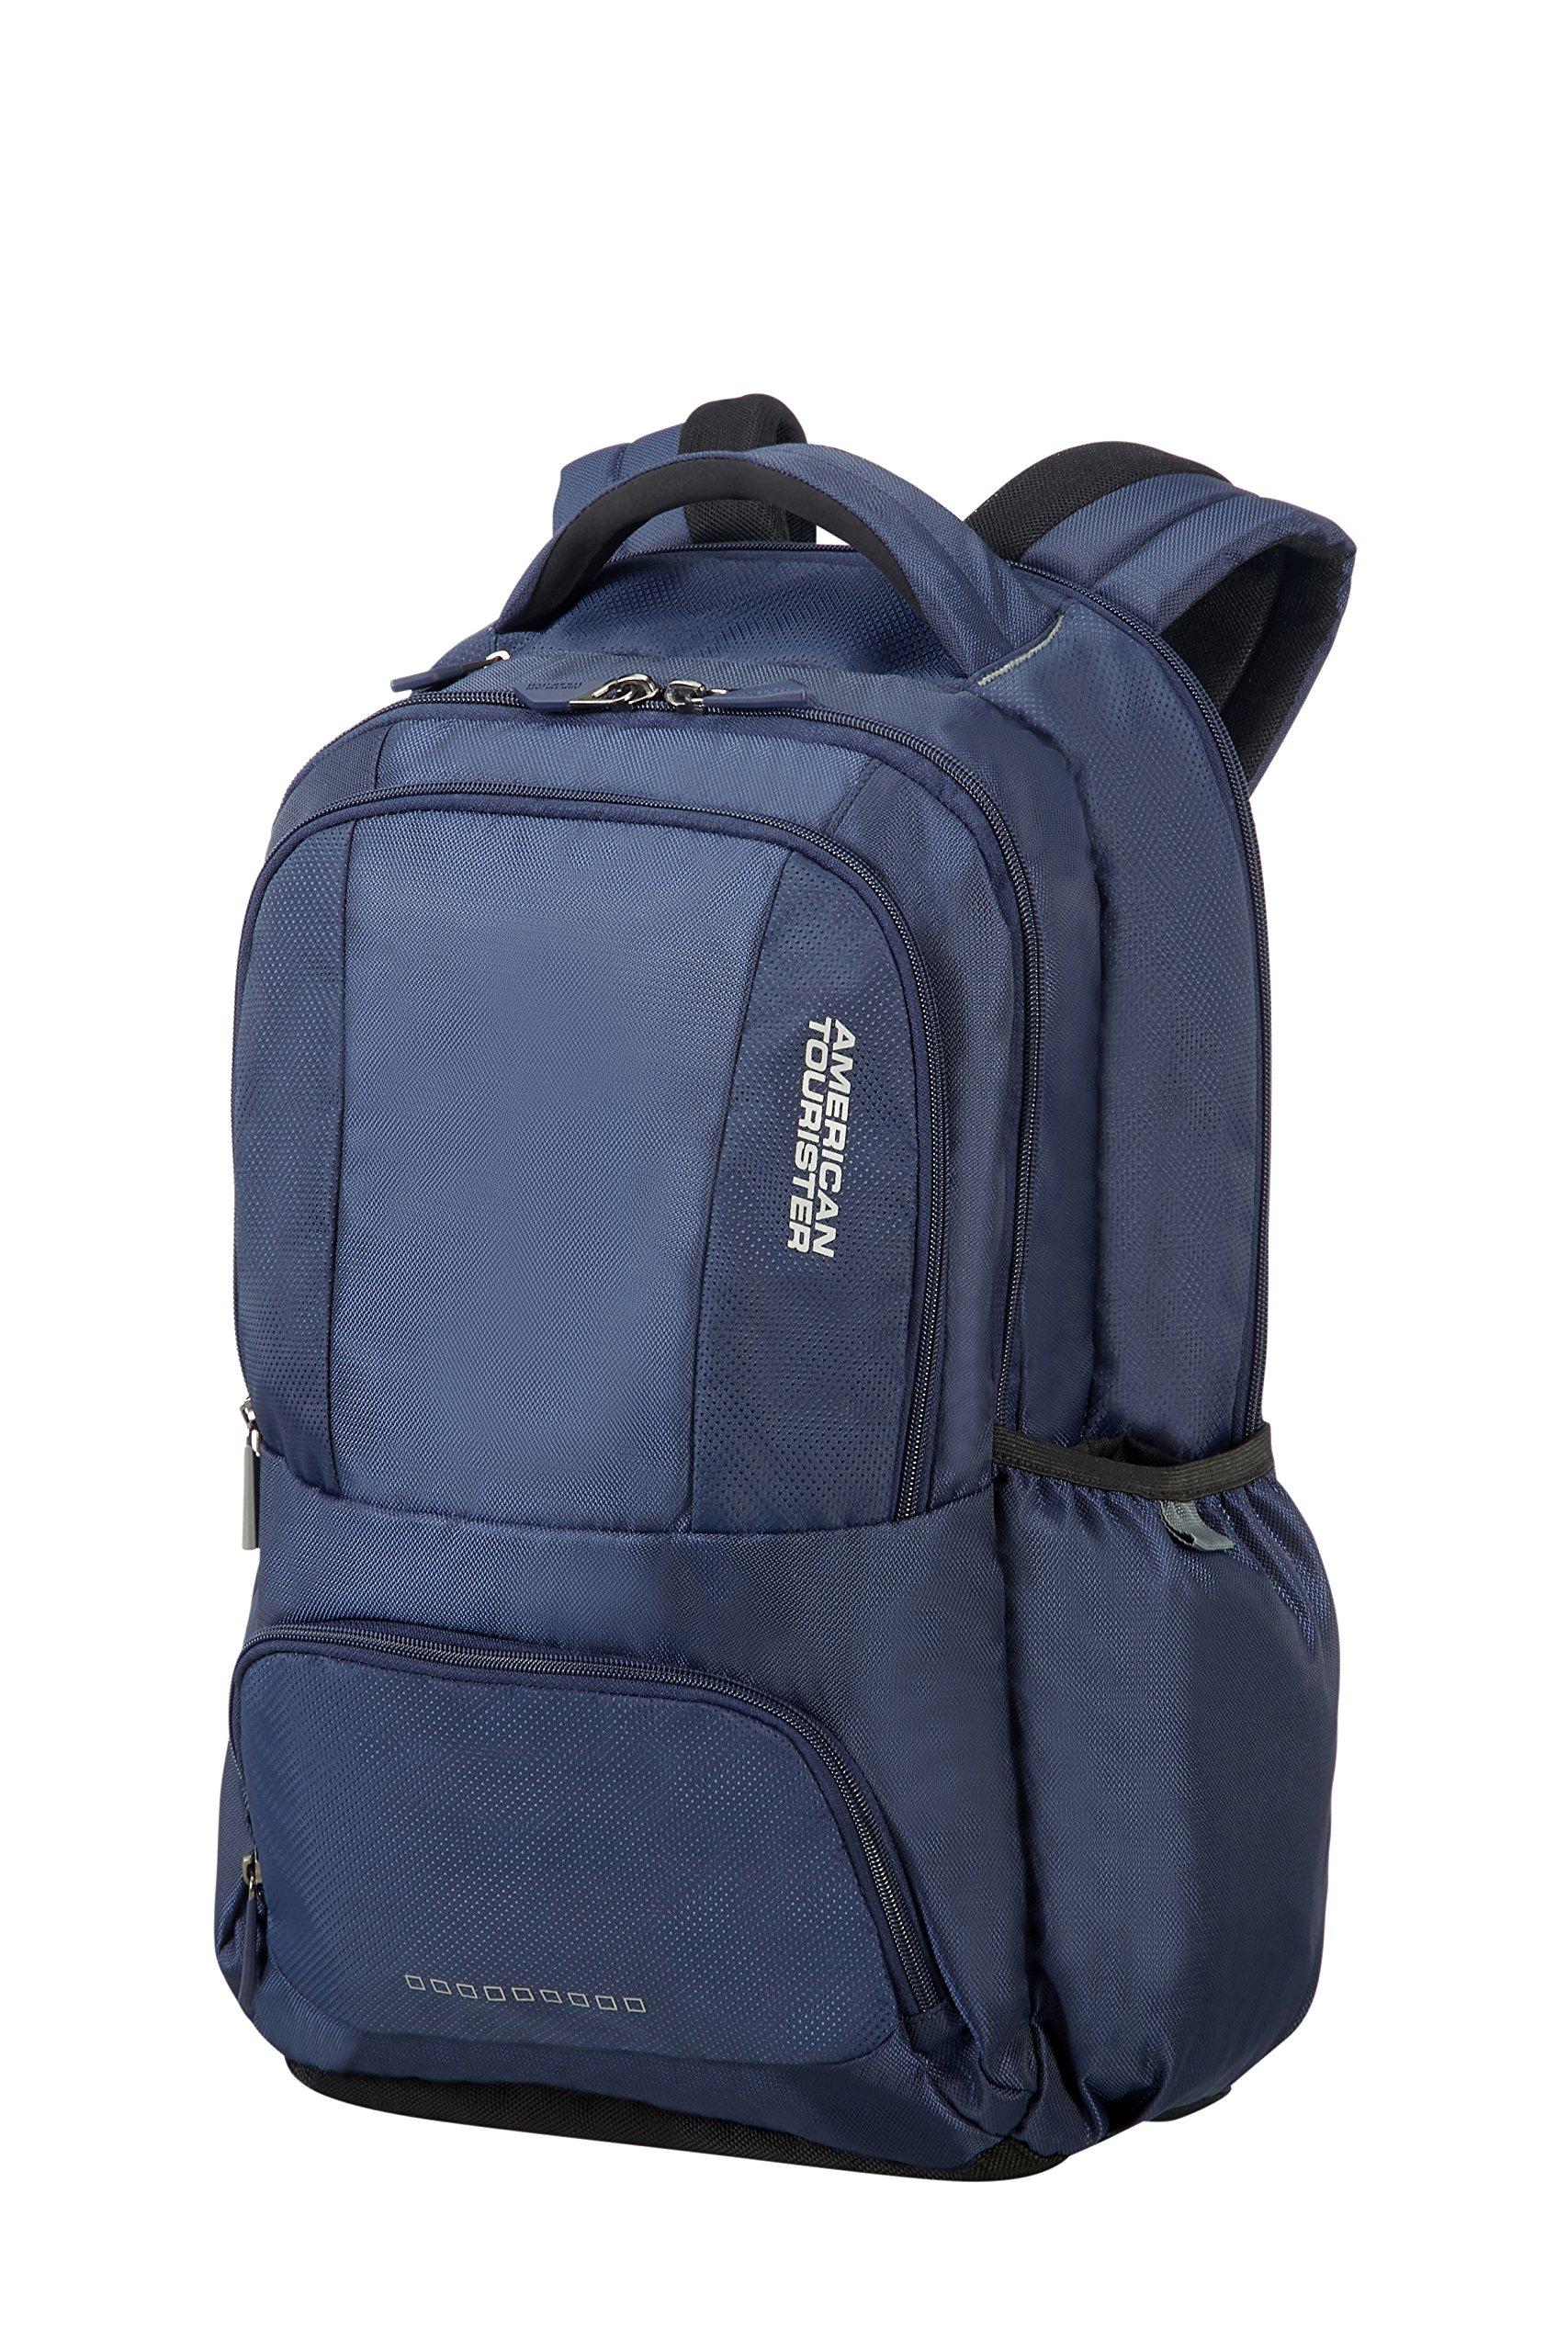 91T%2BSpG09EL - American Tourister Urban Groove - 15.6 pulgadas Mochila para portátil, 50 cm, 27 L, Azul (Blue)